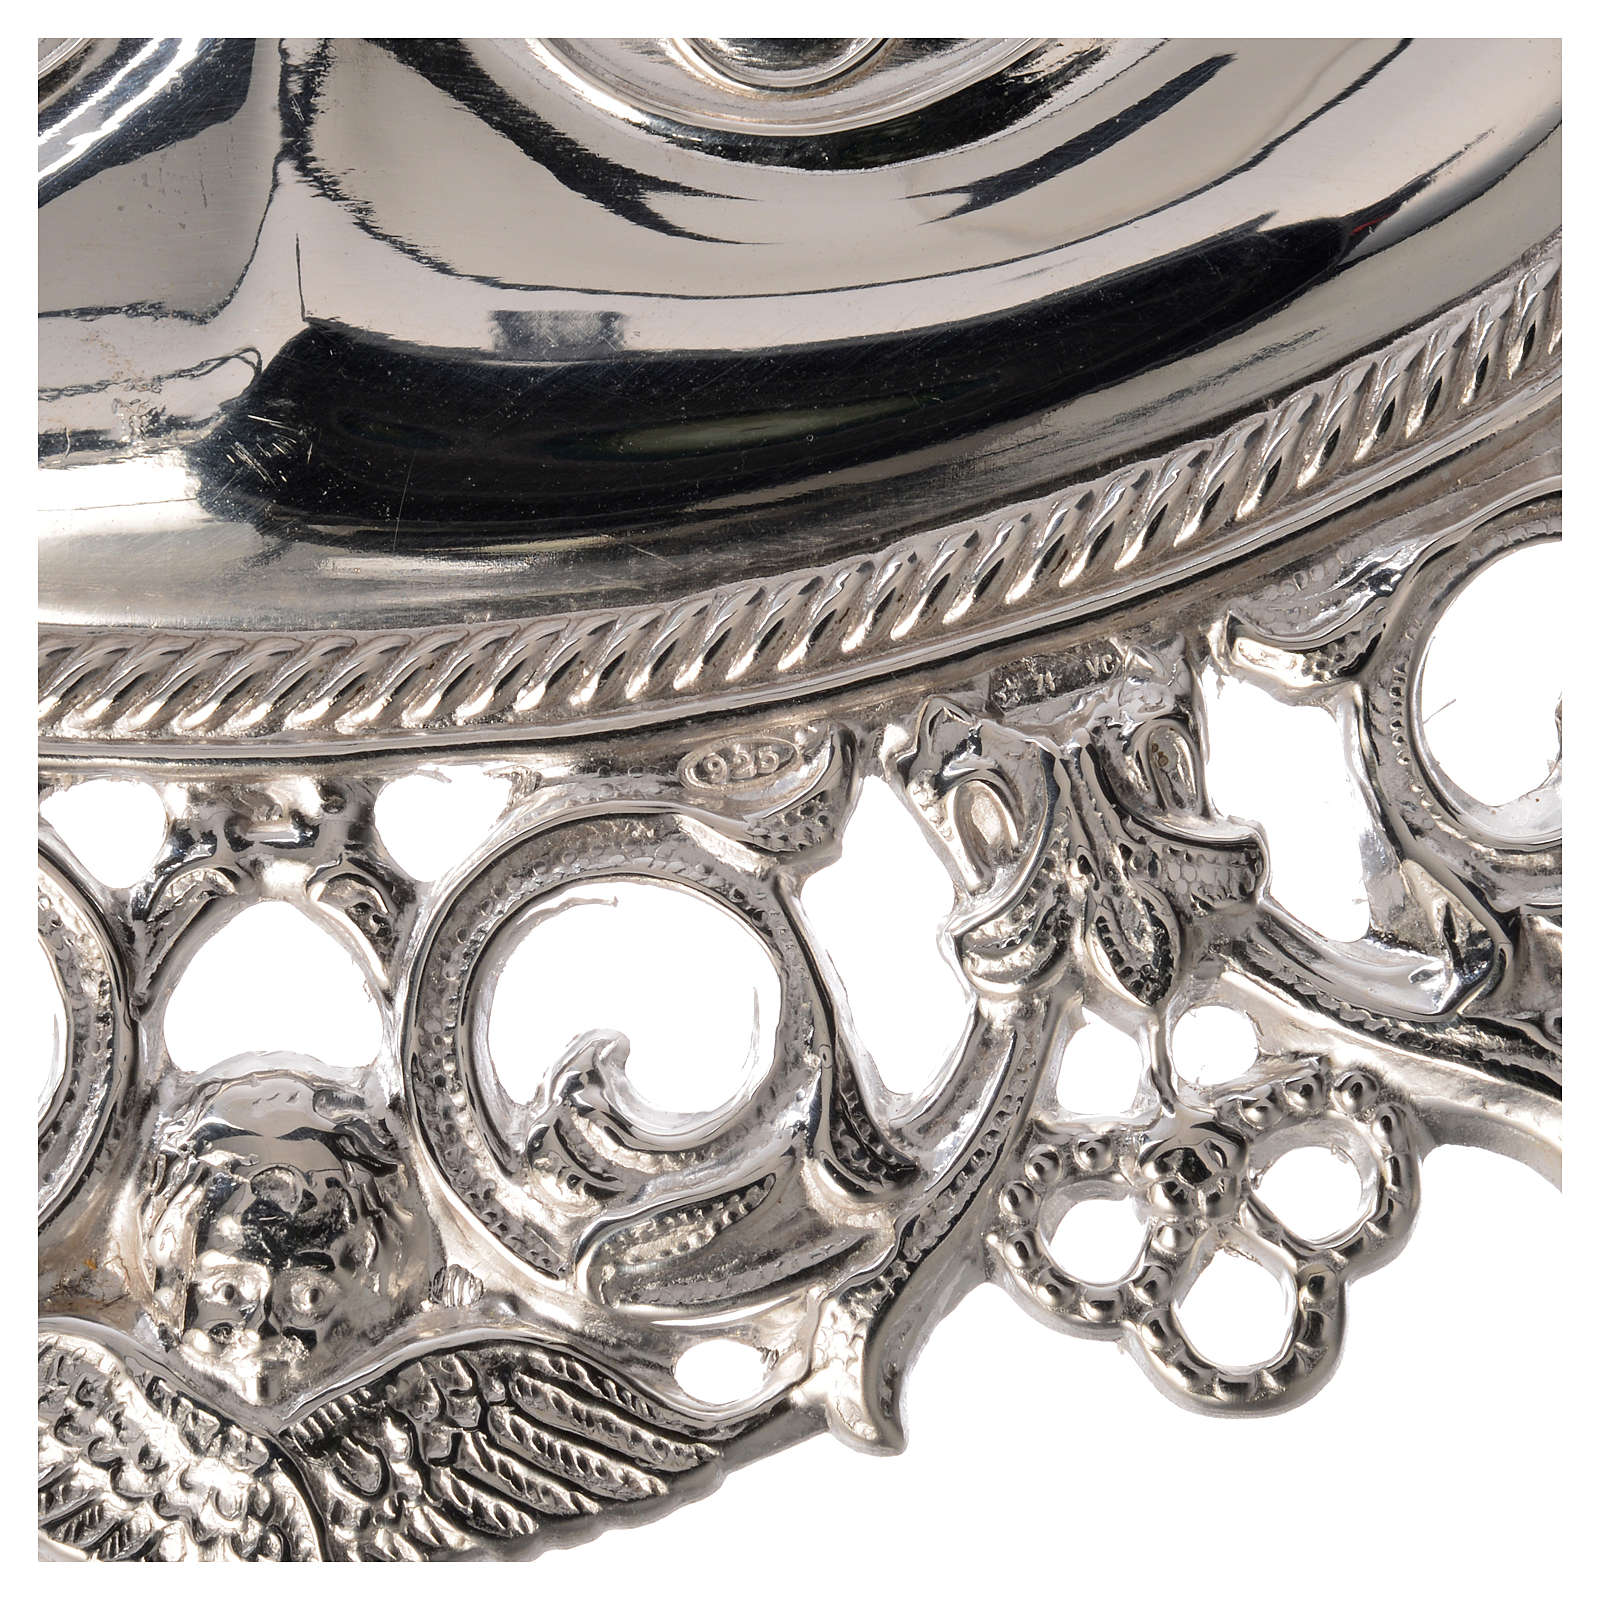 Ex voto occhi traforati argento 925 o metallo 13x8 cm 3